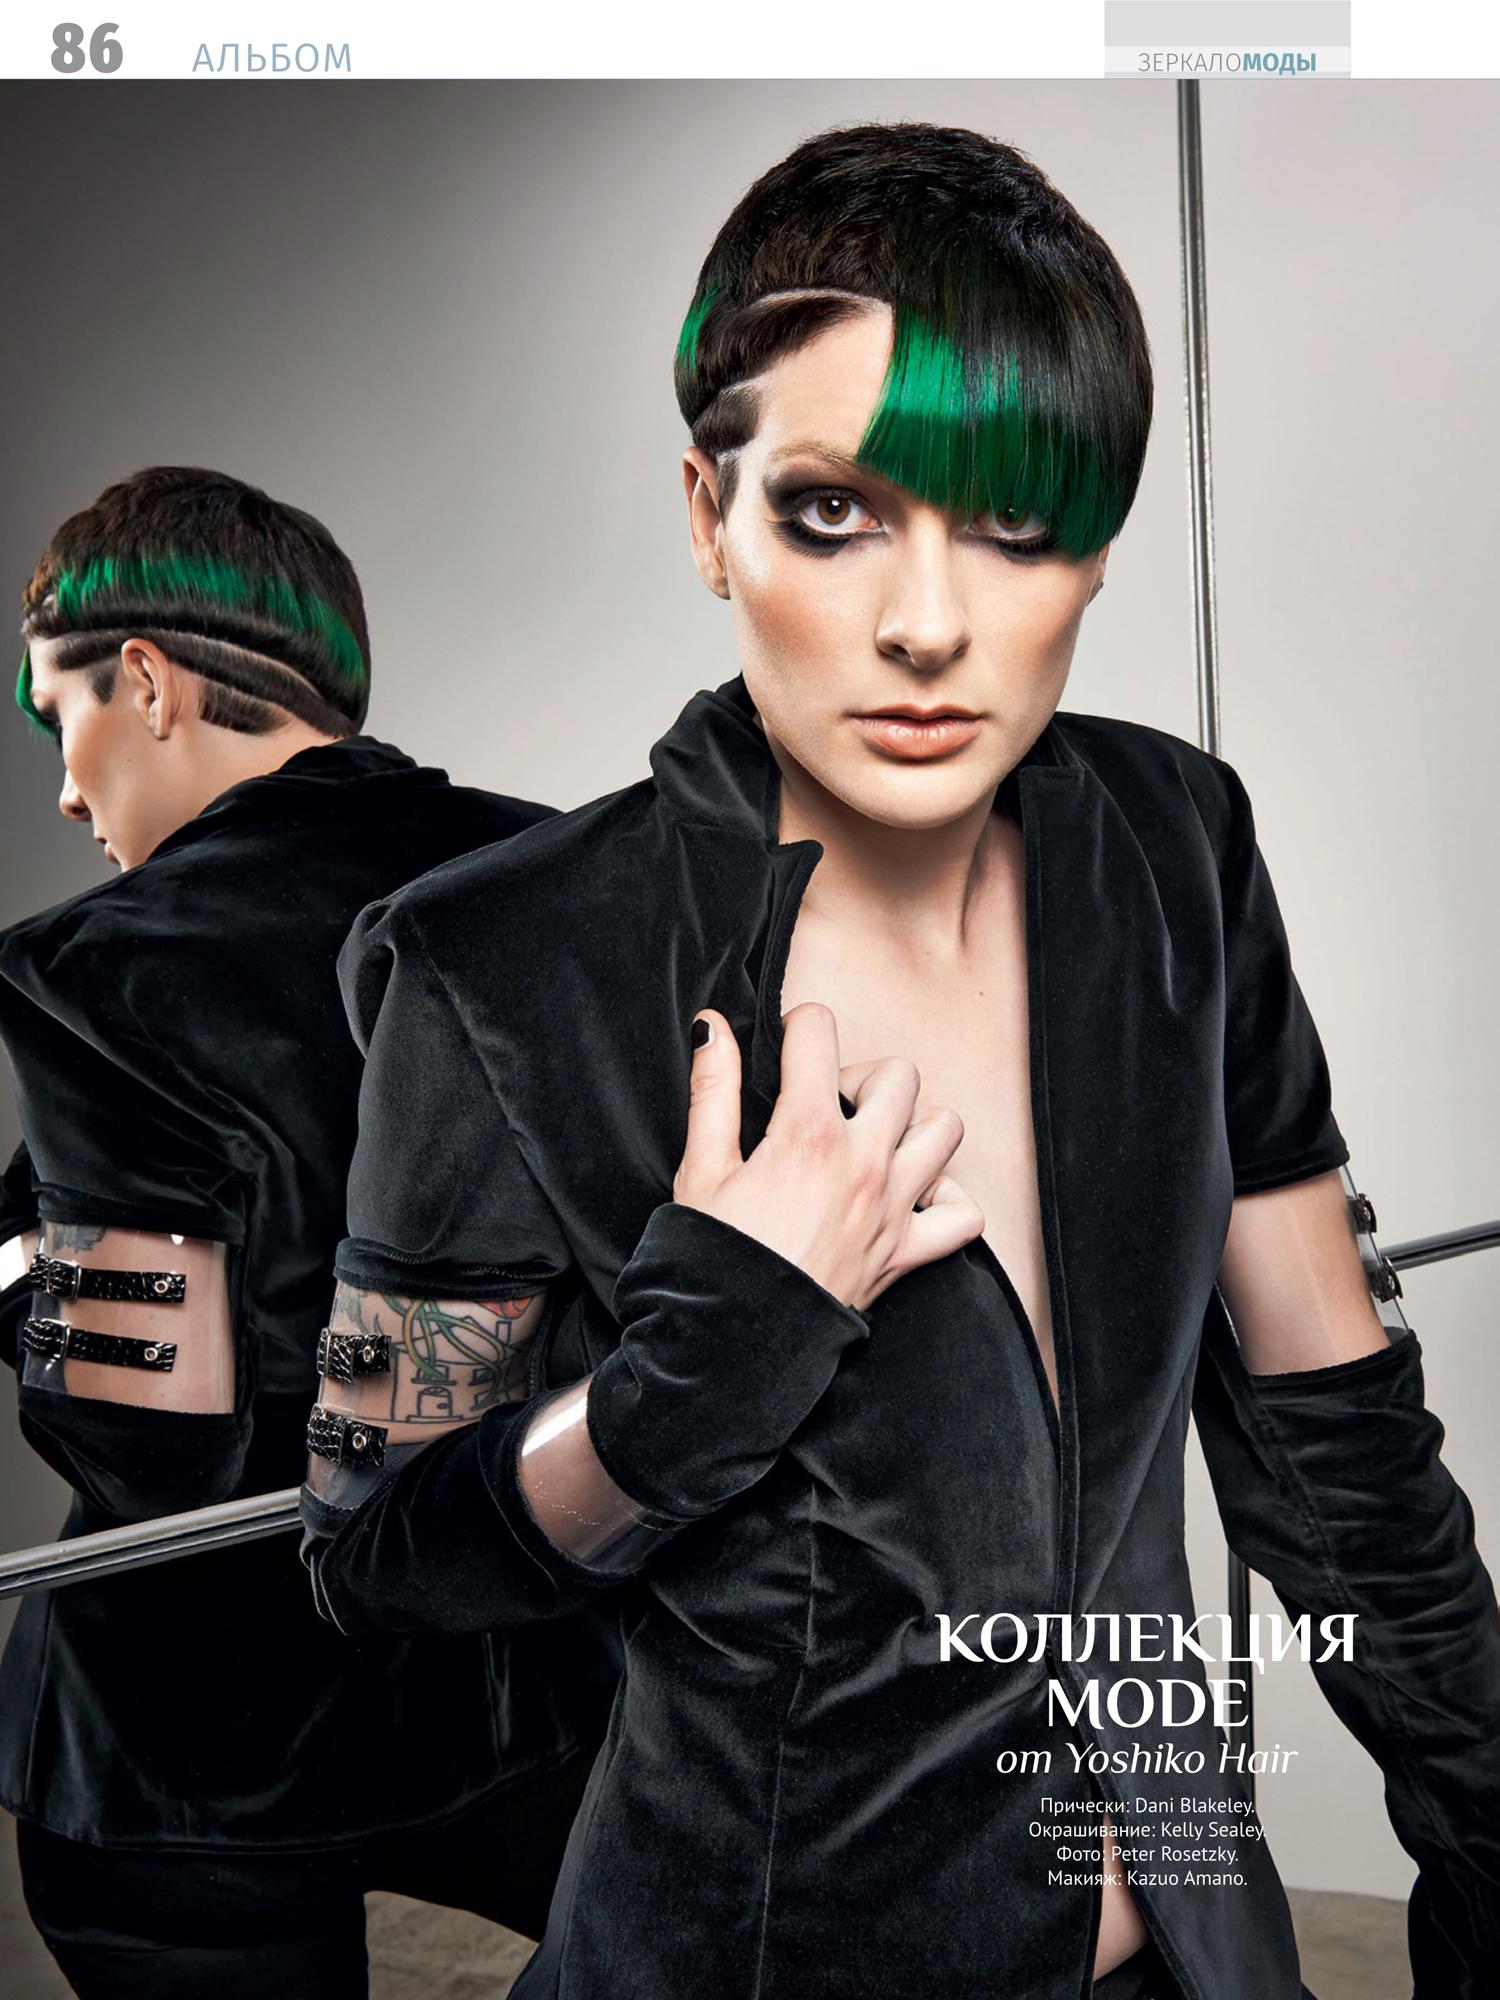 yoshikohair_stkilda_melbourne_hairdresser_hairsalon_zm17_1